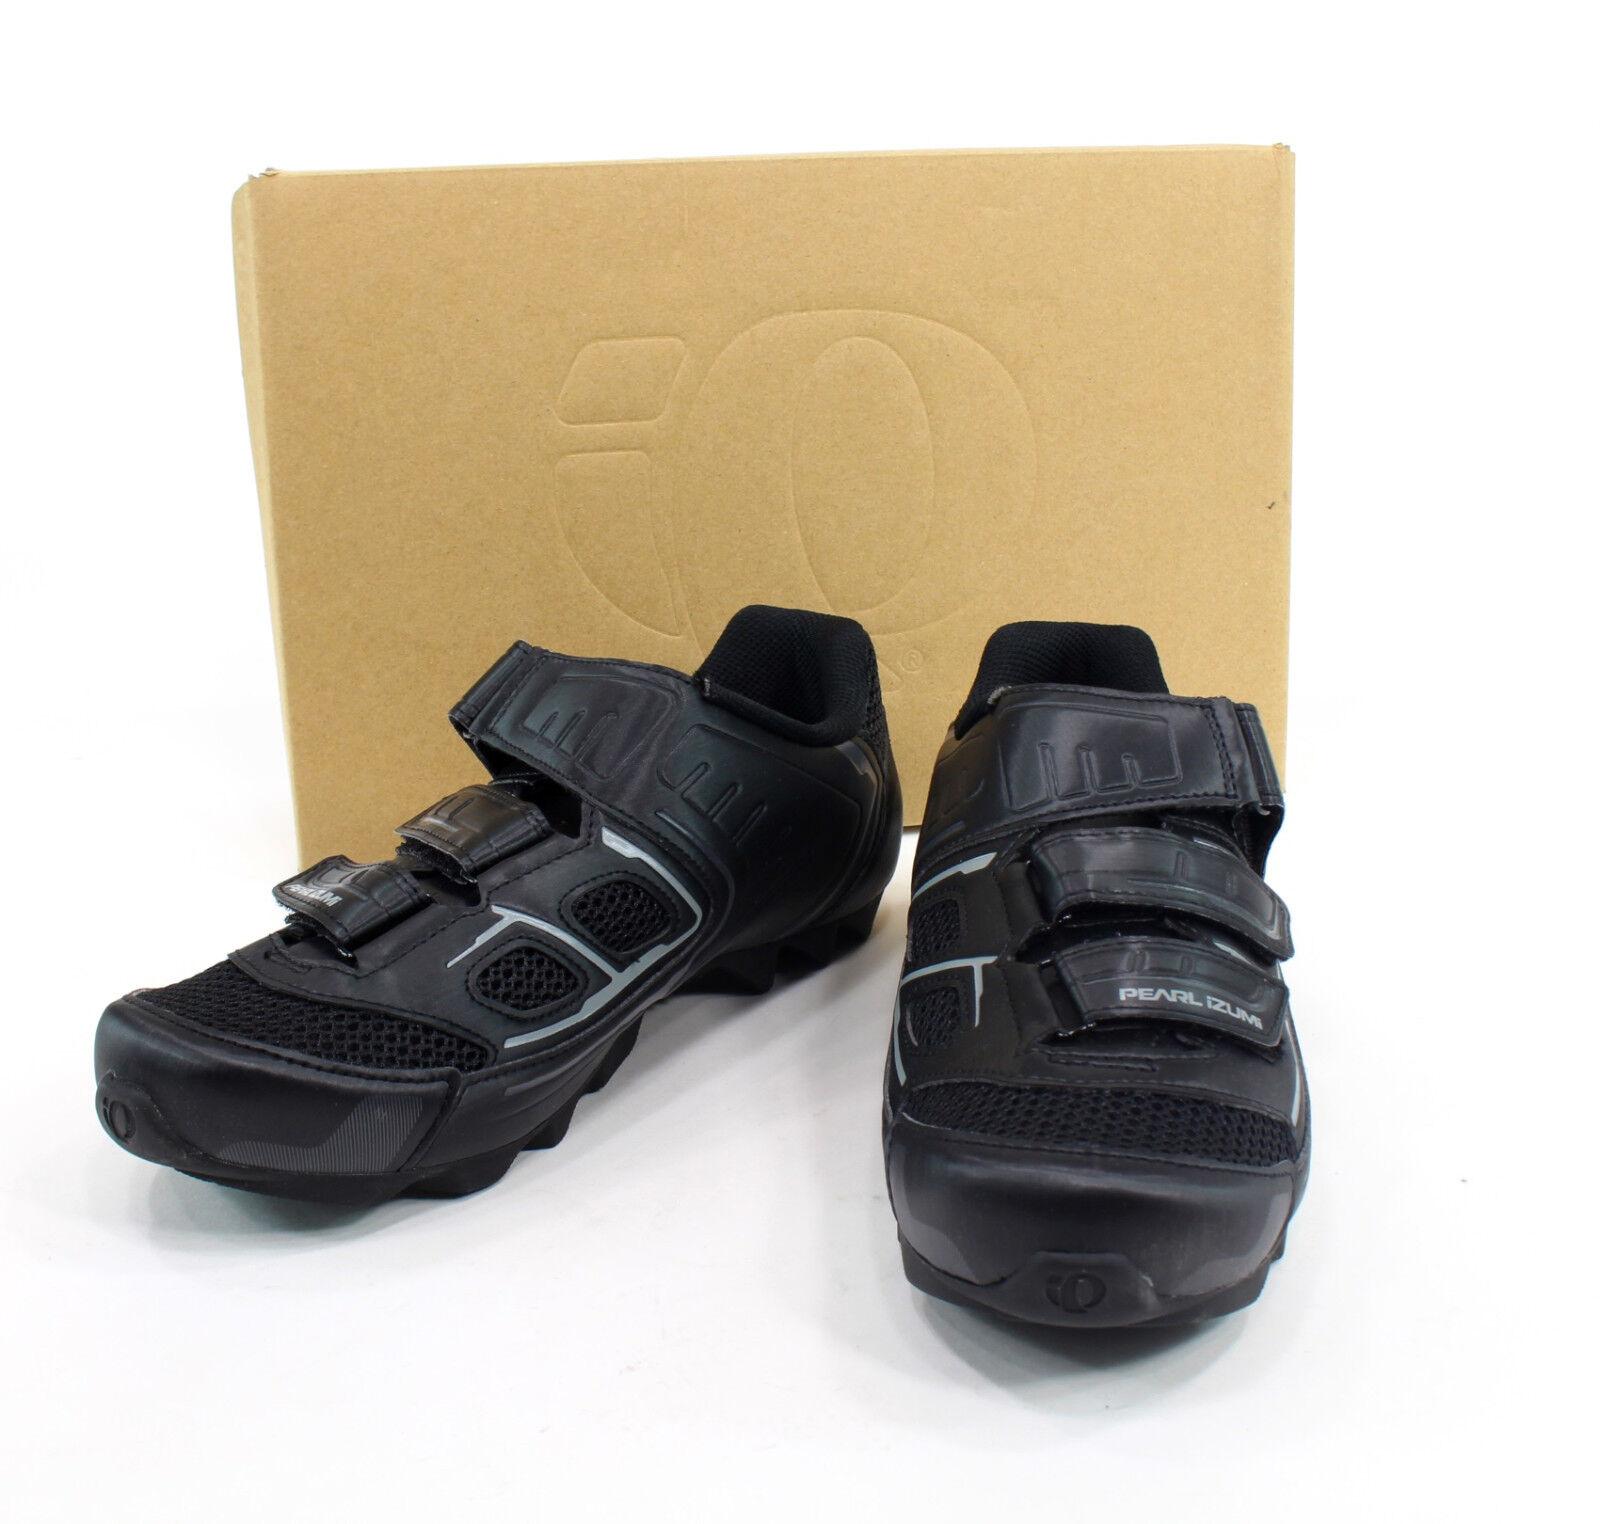 Pearl Izumi All-Road III Cycling shoes 43